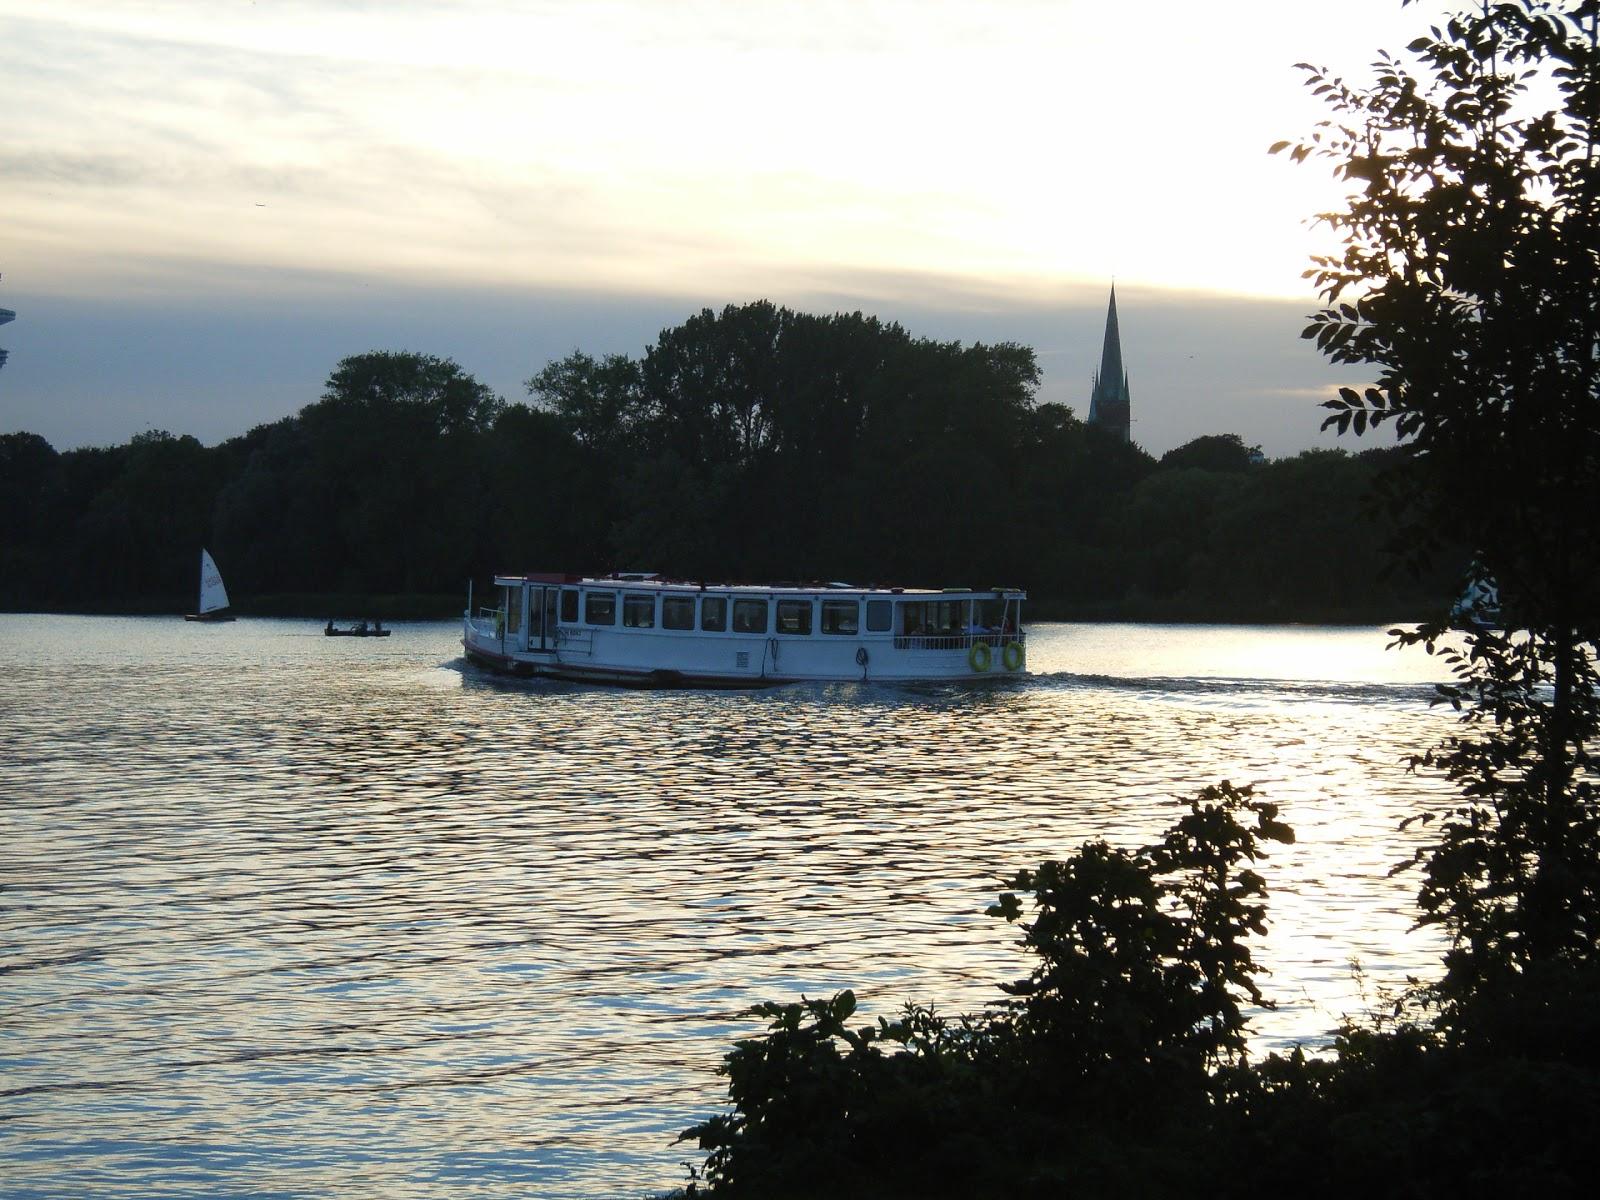 Alster - Fernsehturm - Segelboot - Ruderer - Alsterboot